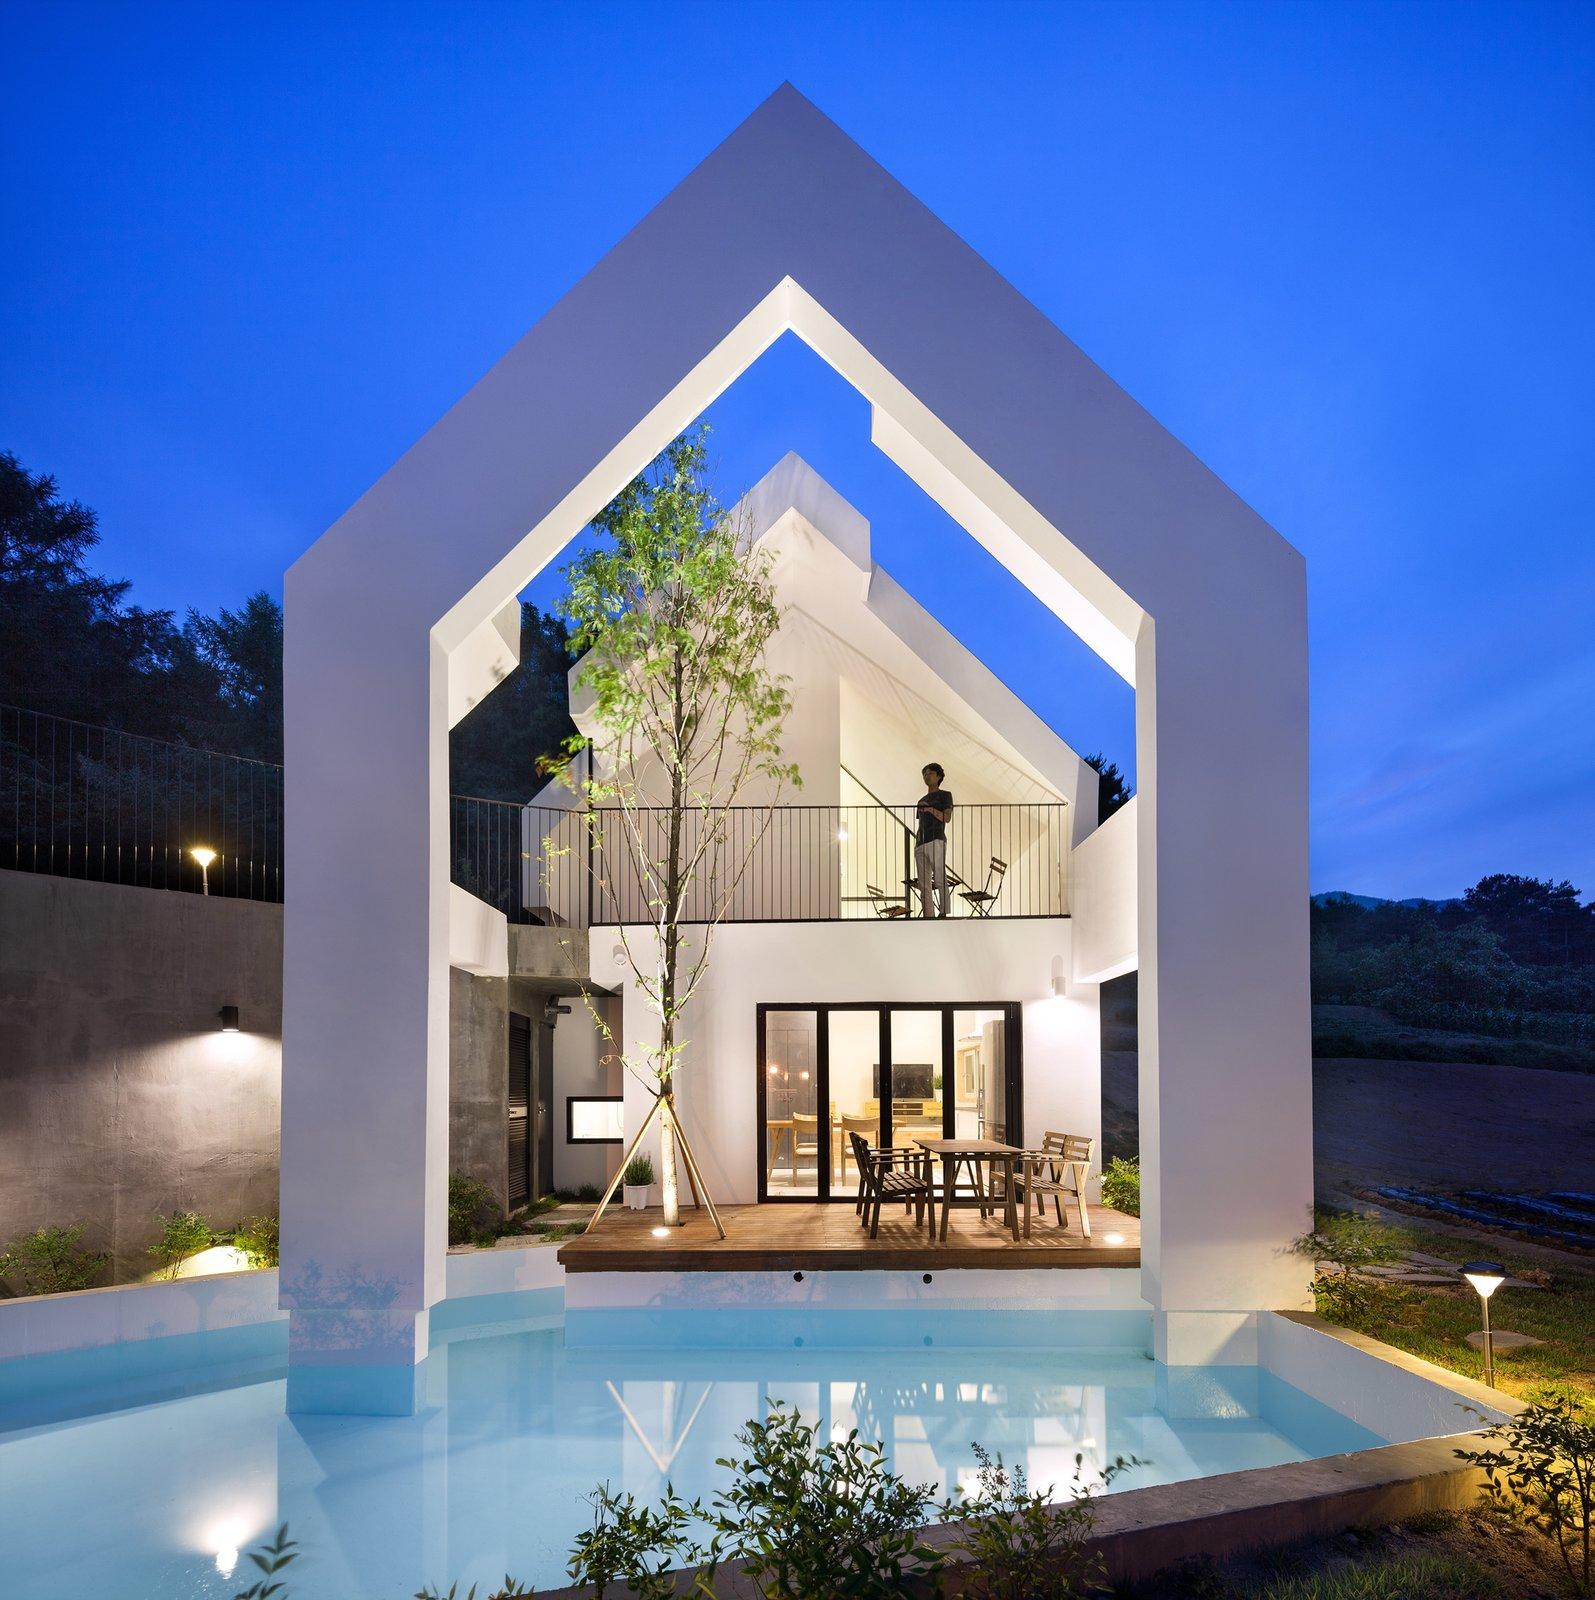 Baomaru House by Rieuldorang Atelier Pool